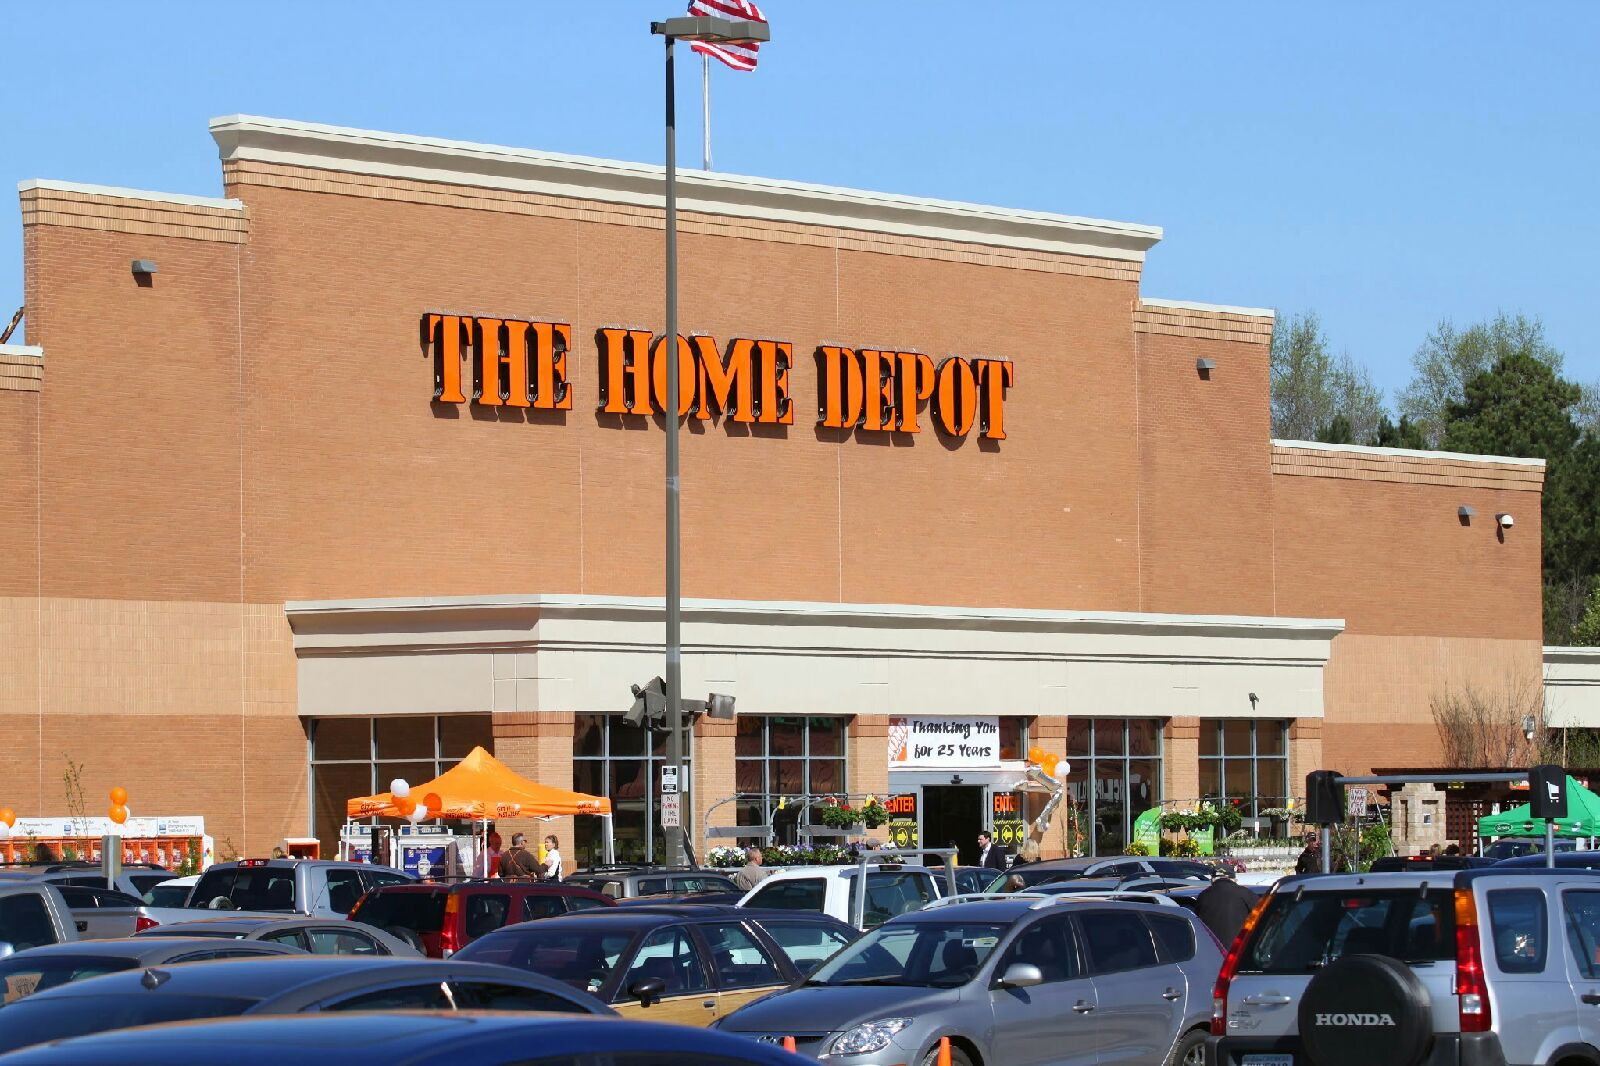 The Home Depot 4101 Roswell Rd Marietta, GA Home Depot - MapQuest